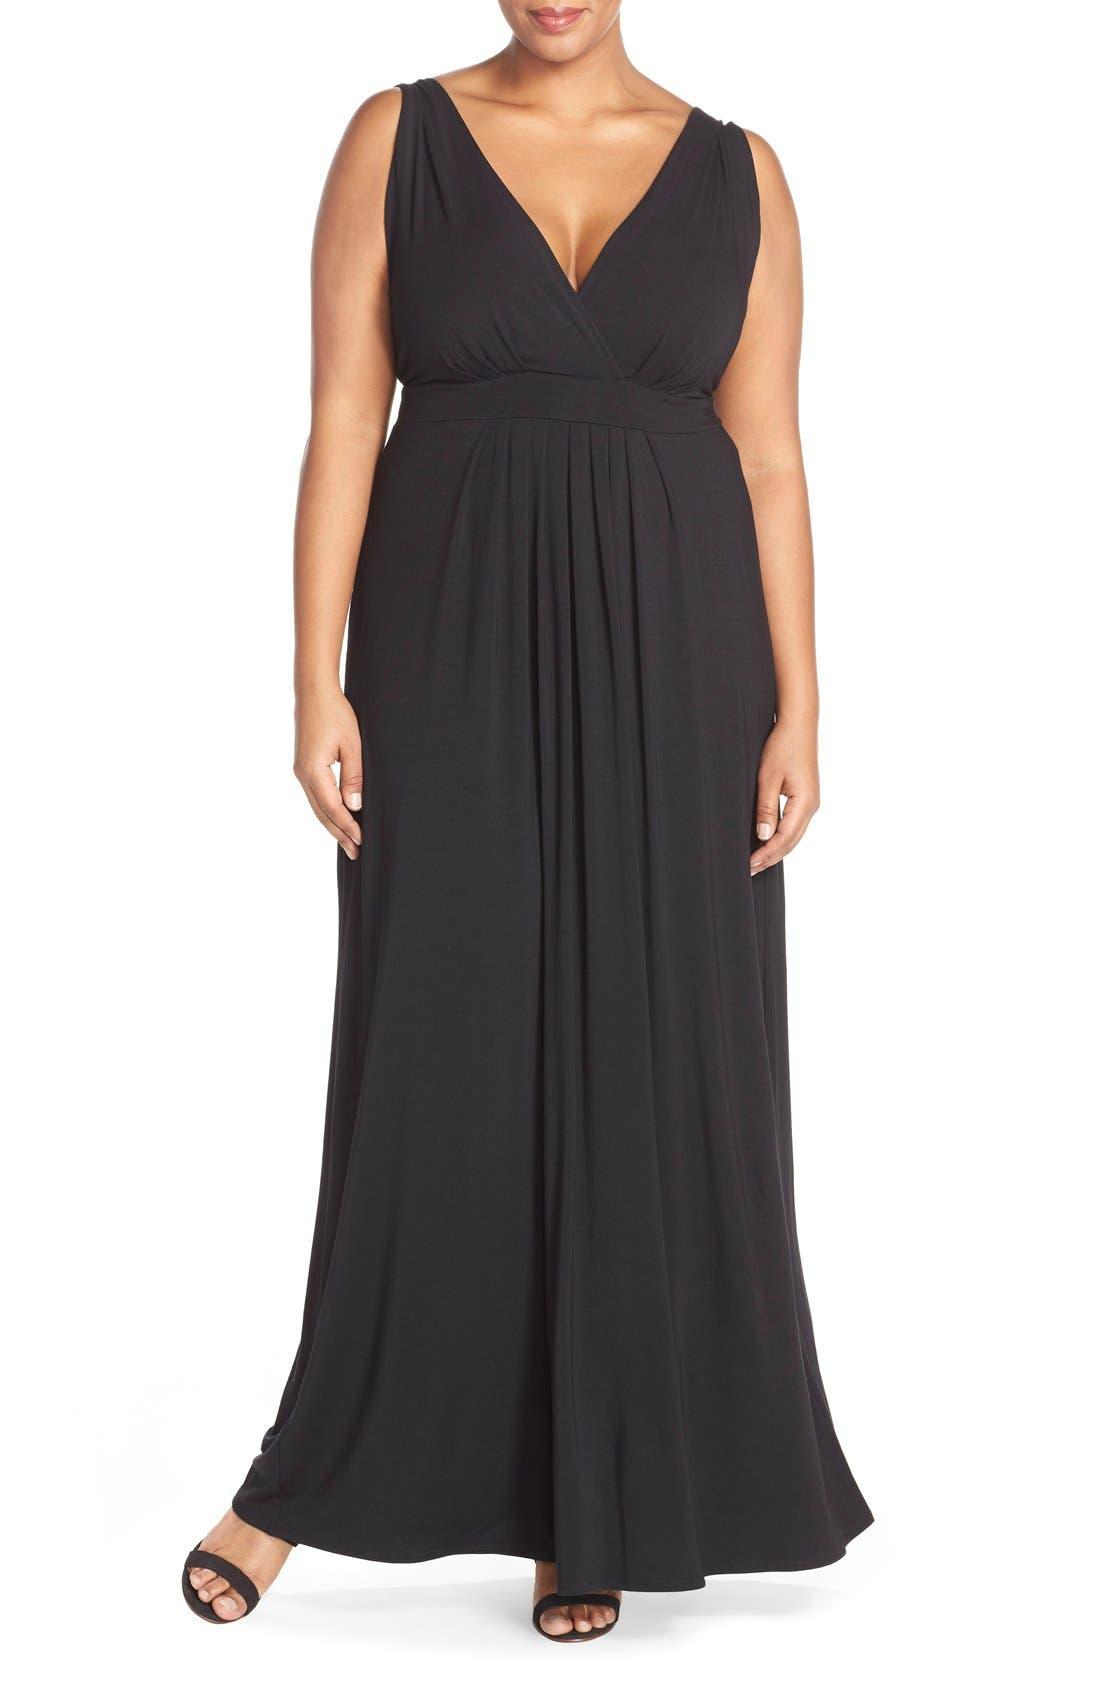 Chloe Empire Waist Maxi Dress,                         Main,                         color, Black